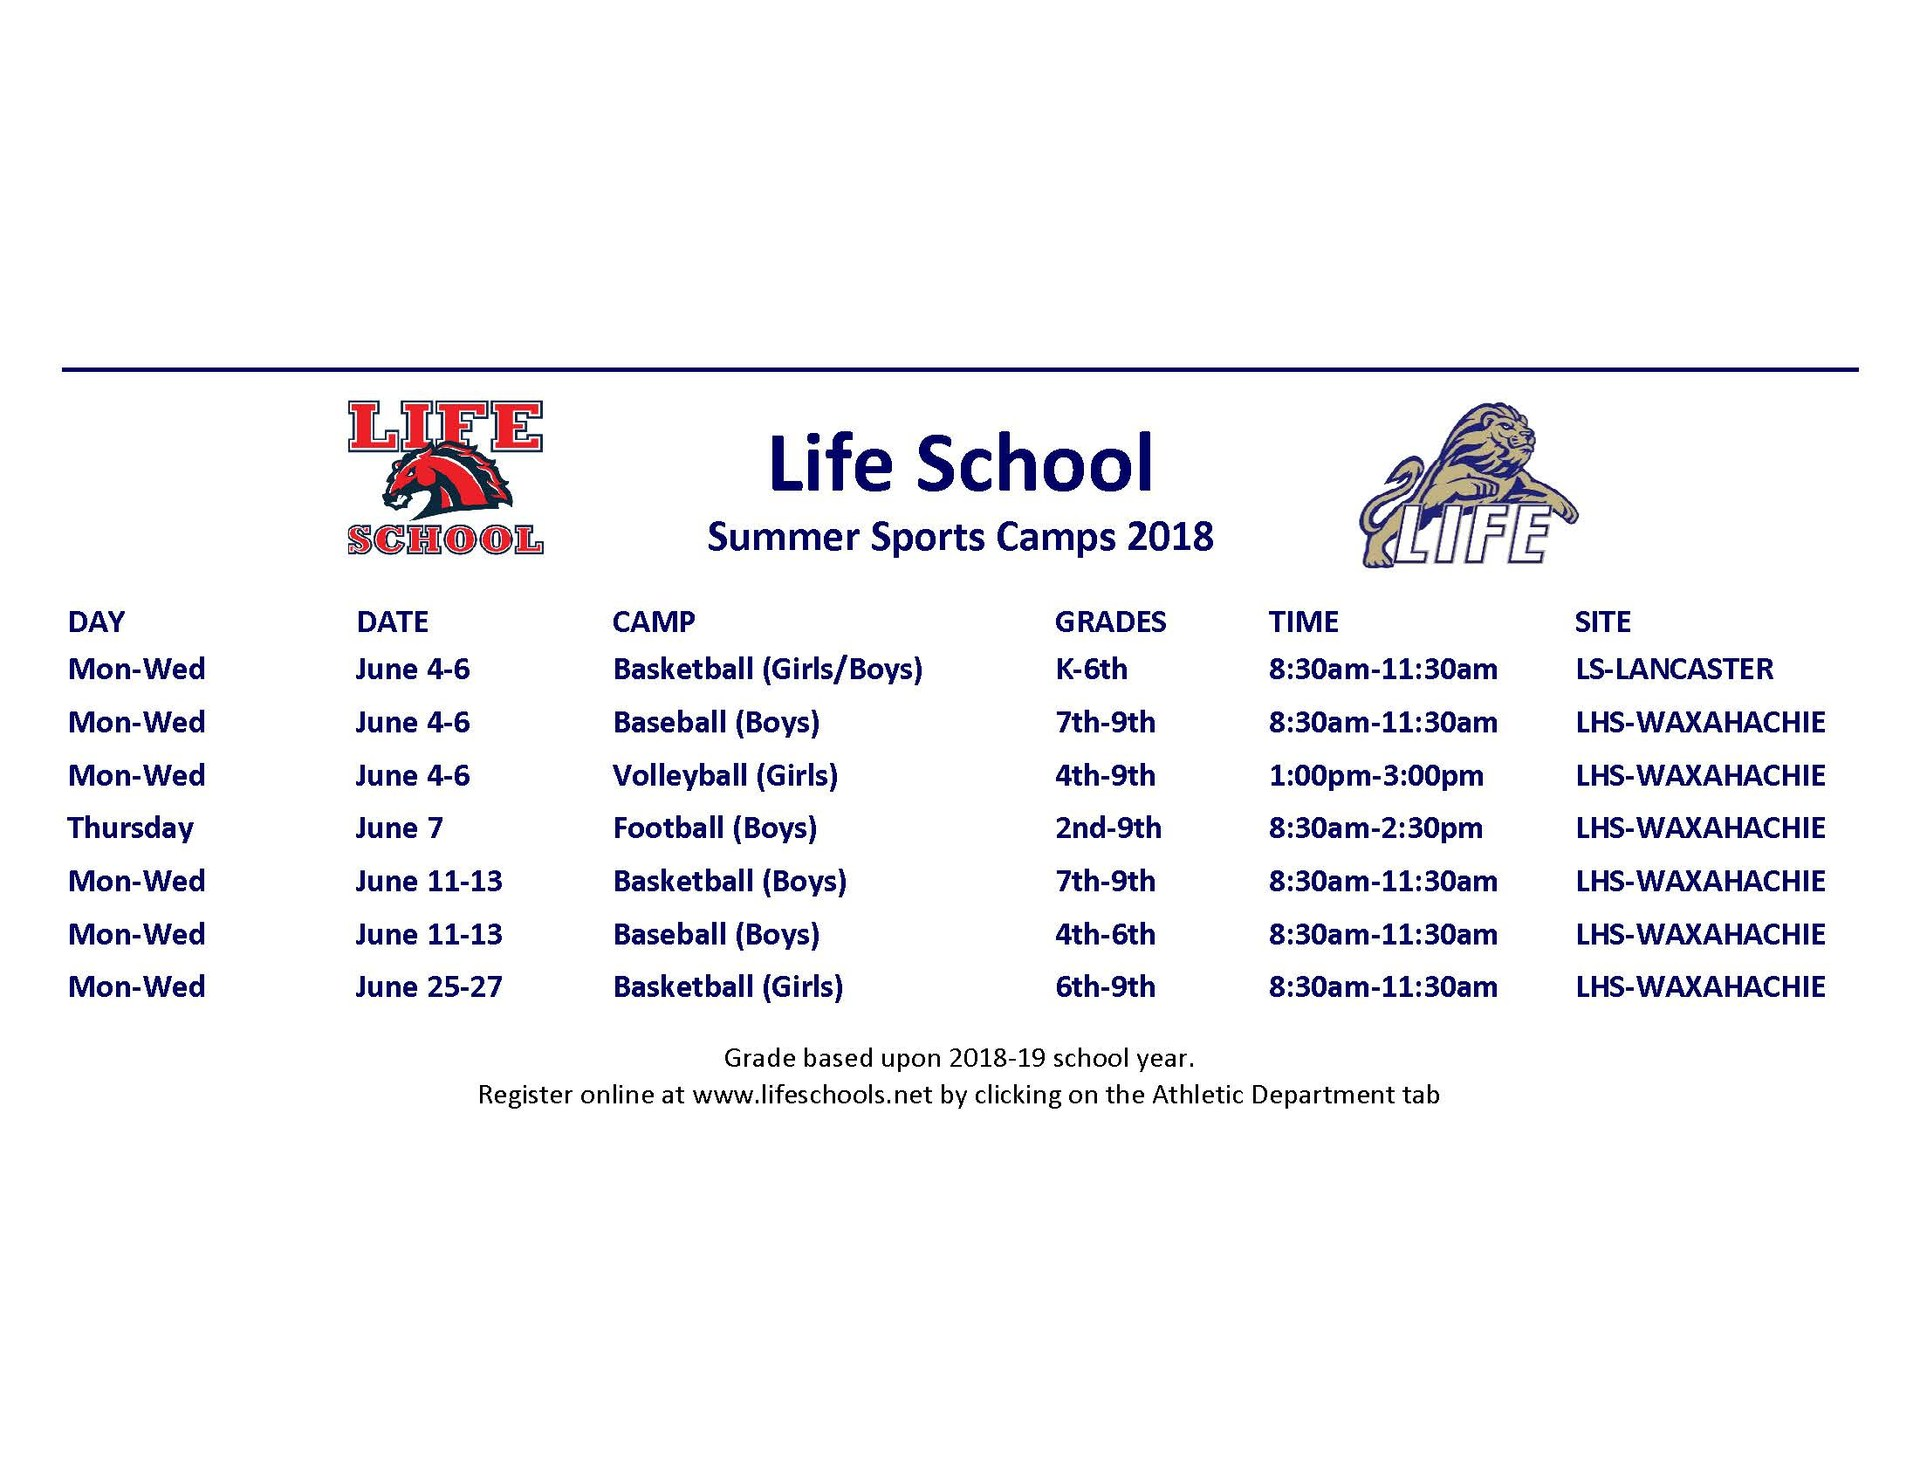 Summer Sports Camp 2018 schedule